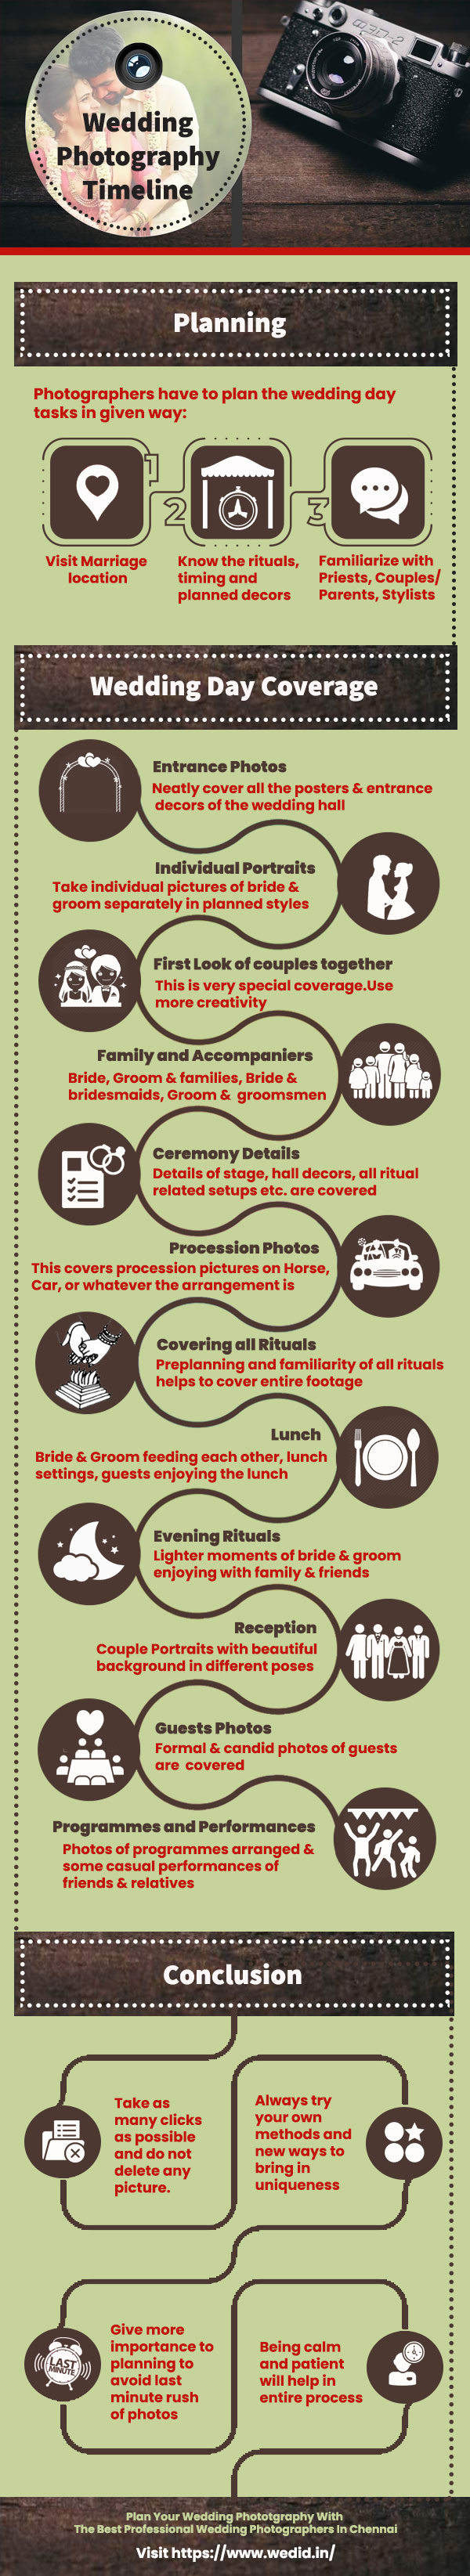 wedding-photography-timeline-infographic-plaza